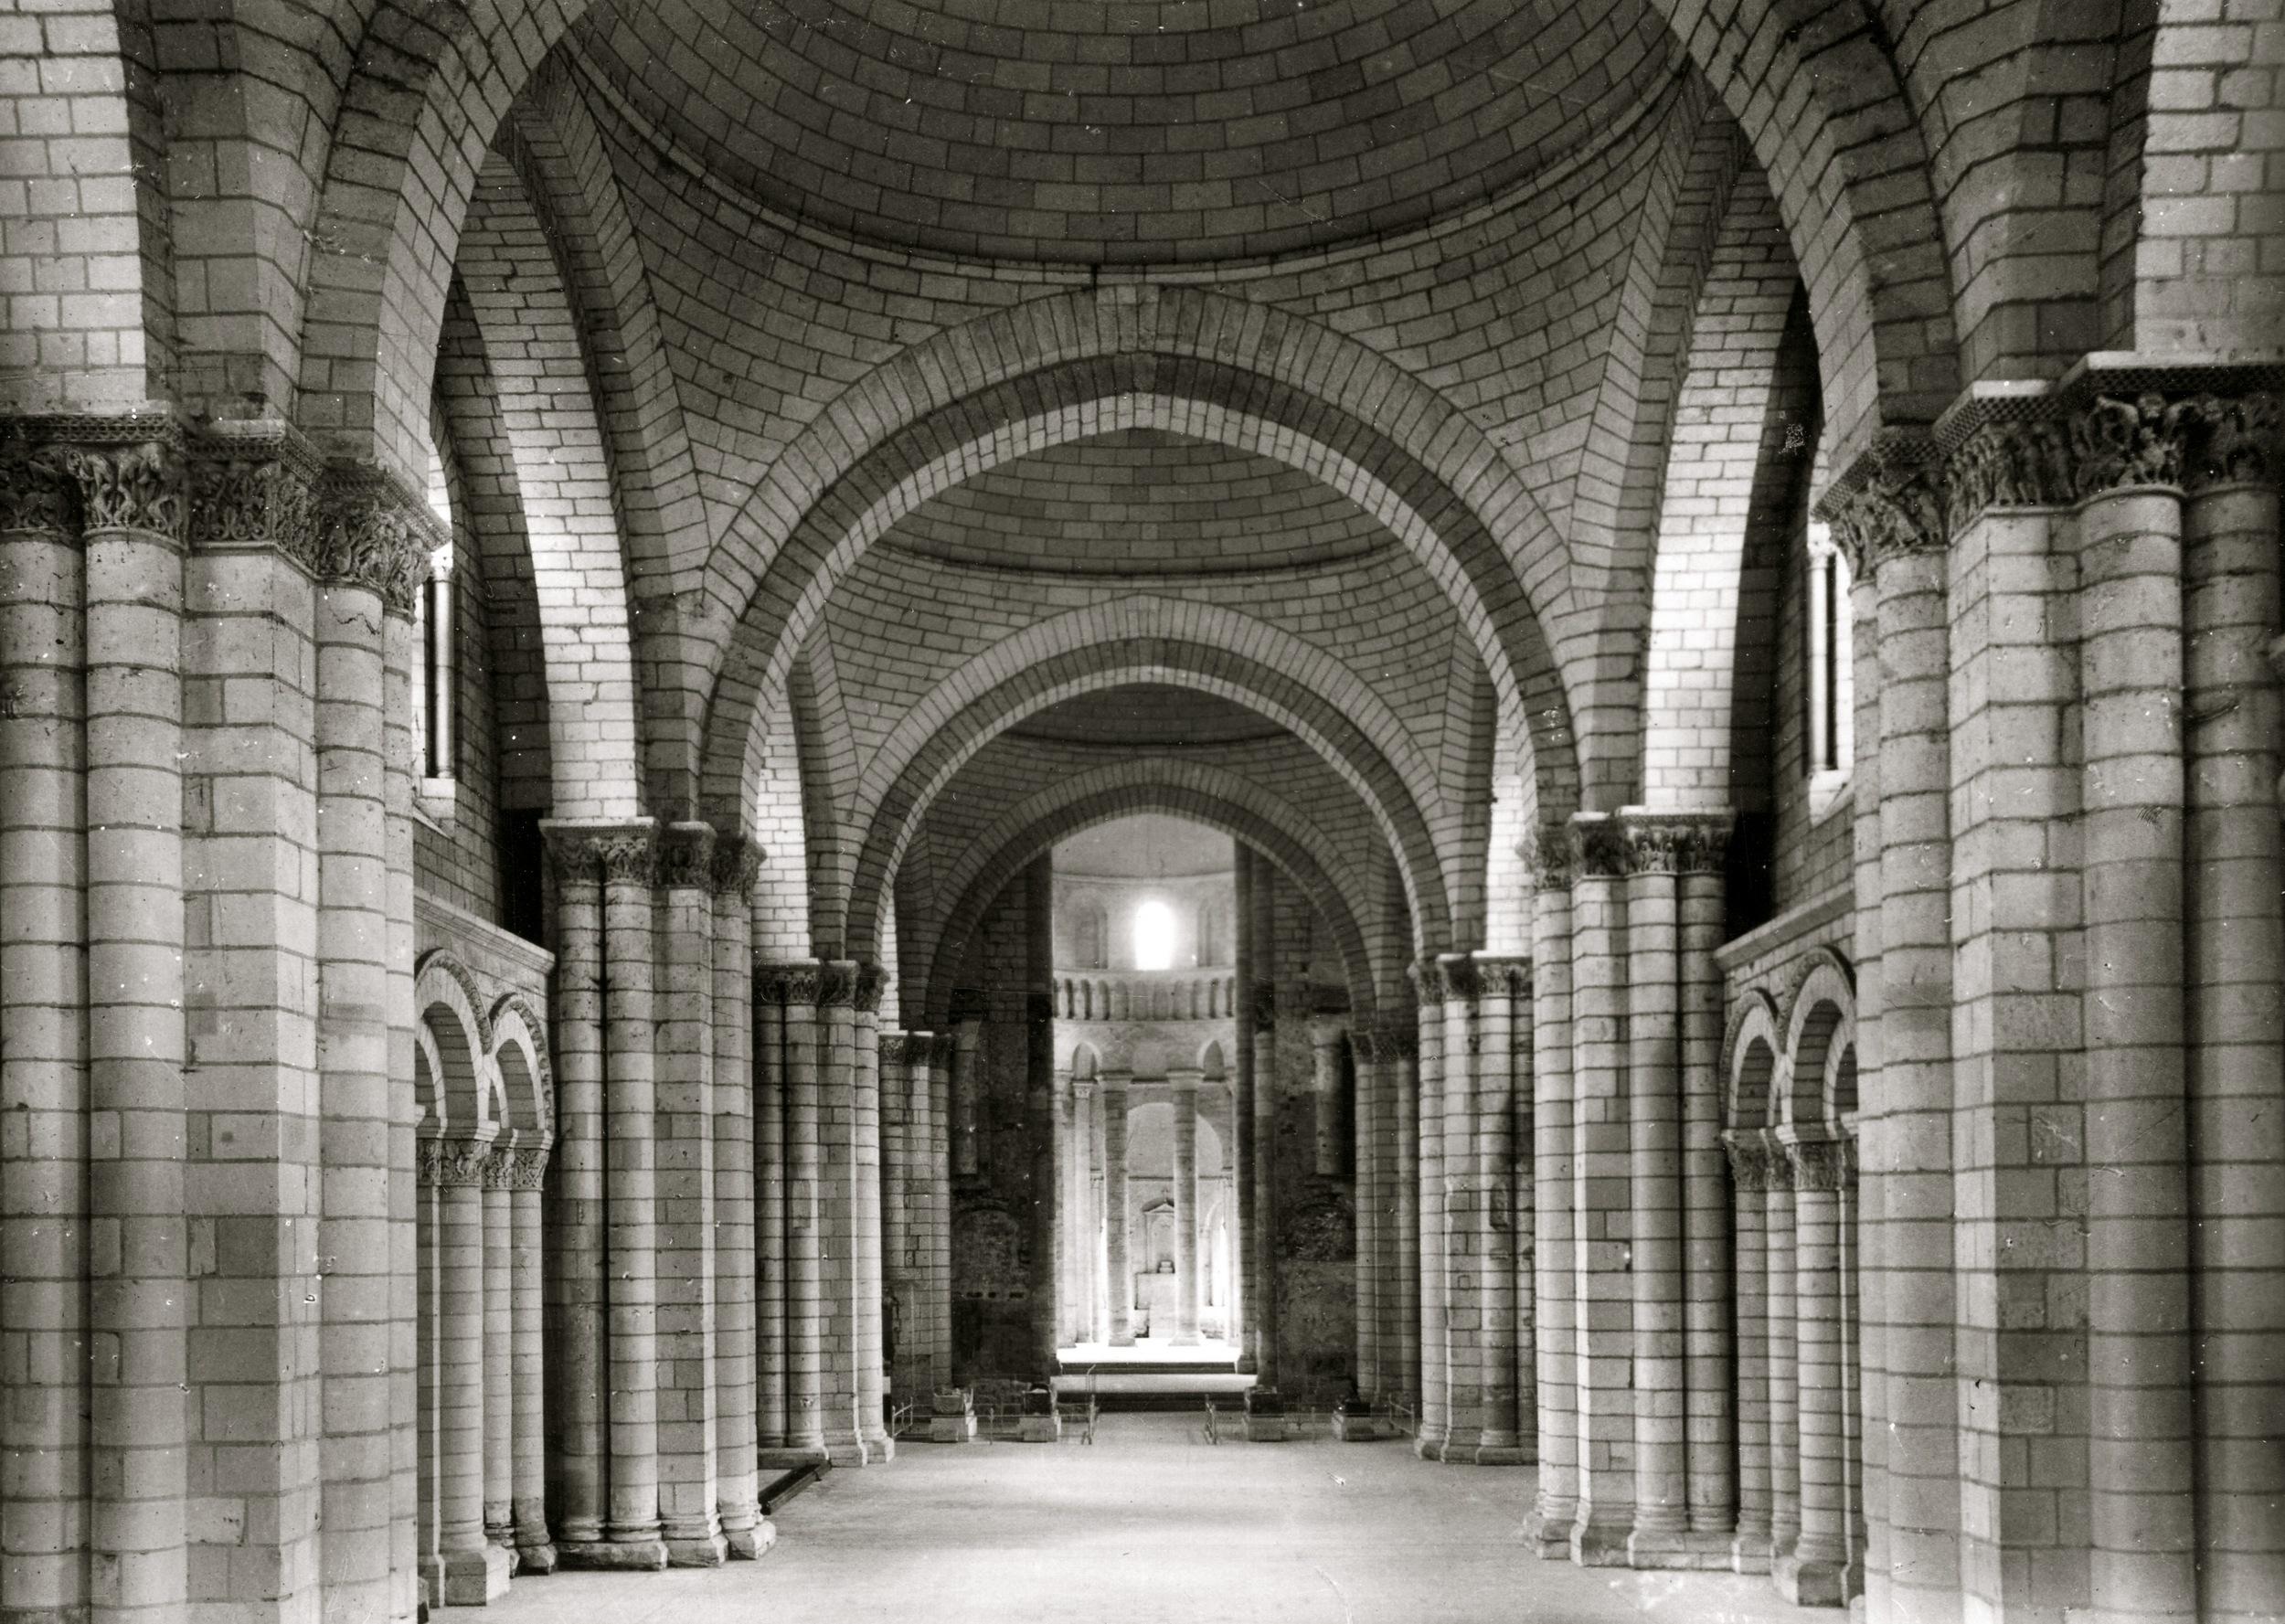 Fontrevault Abbey